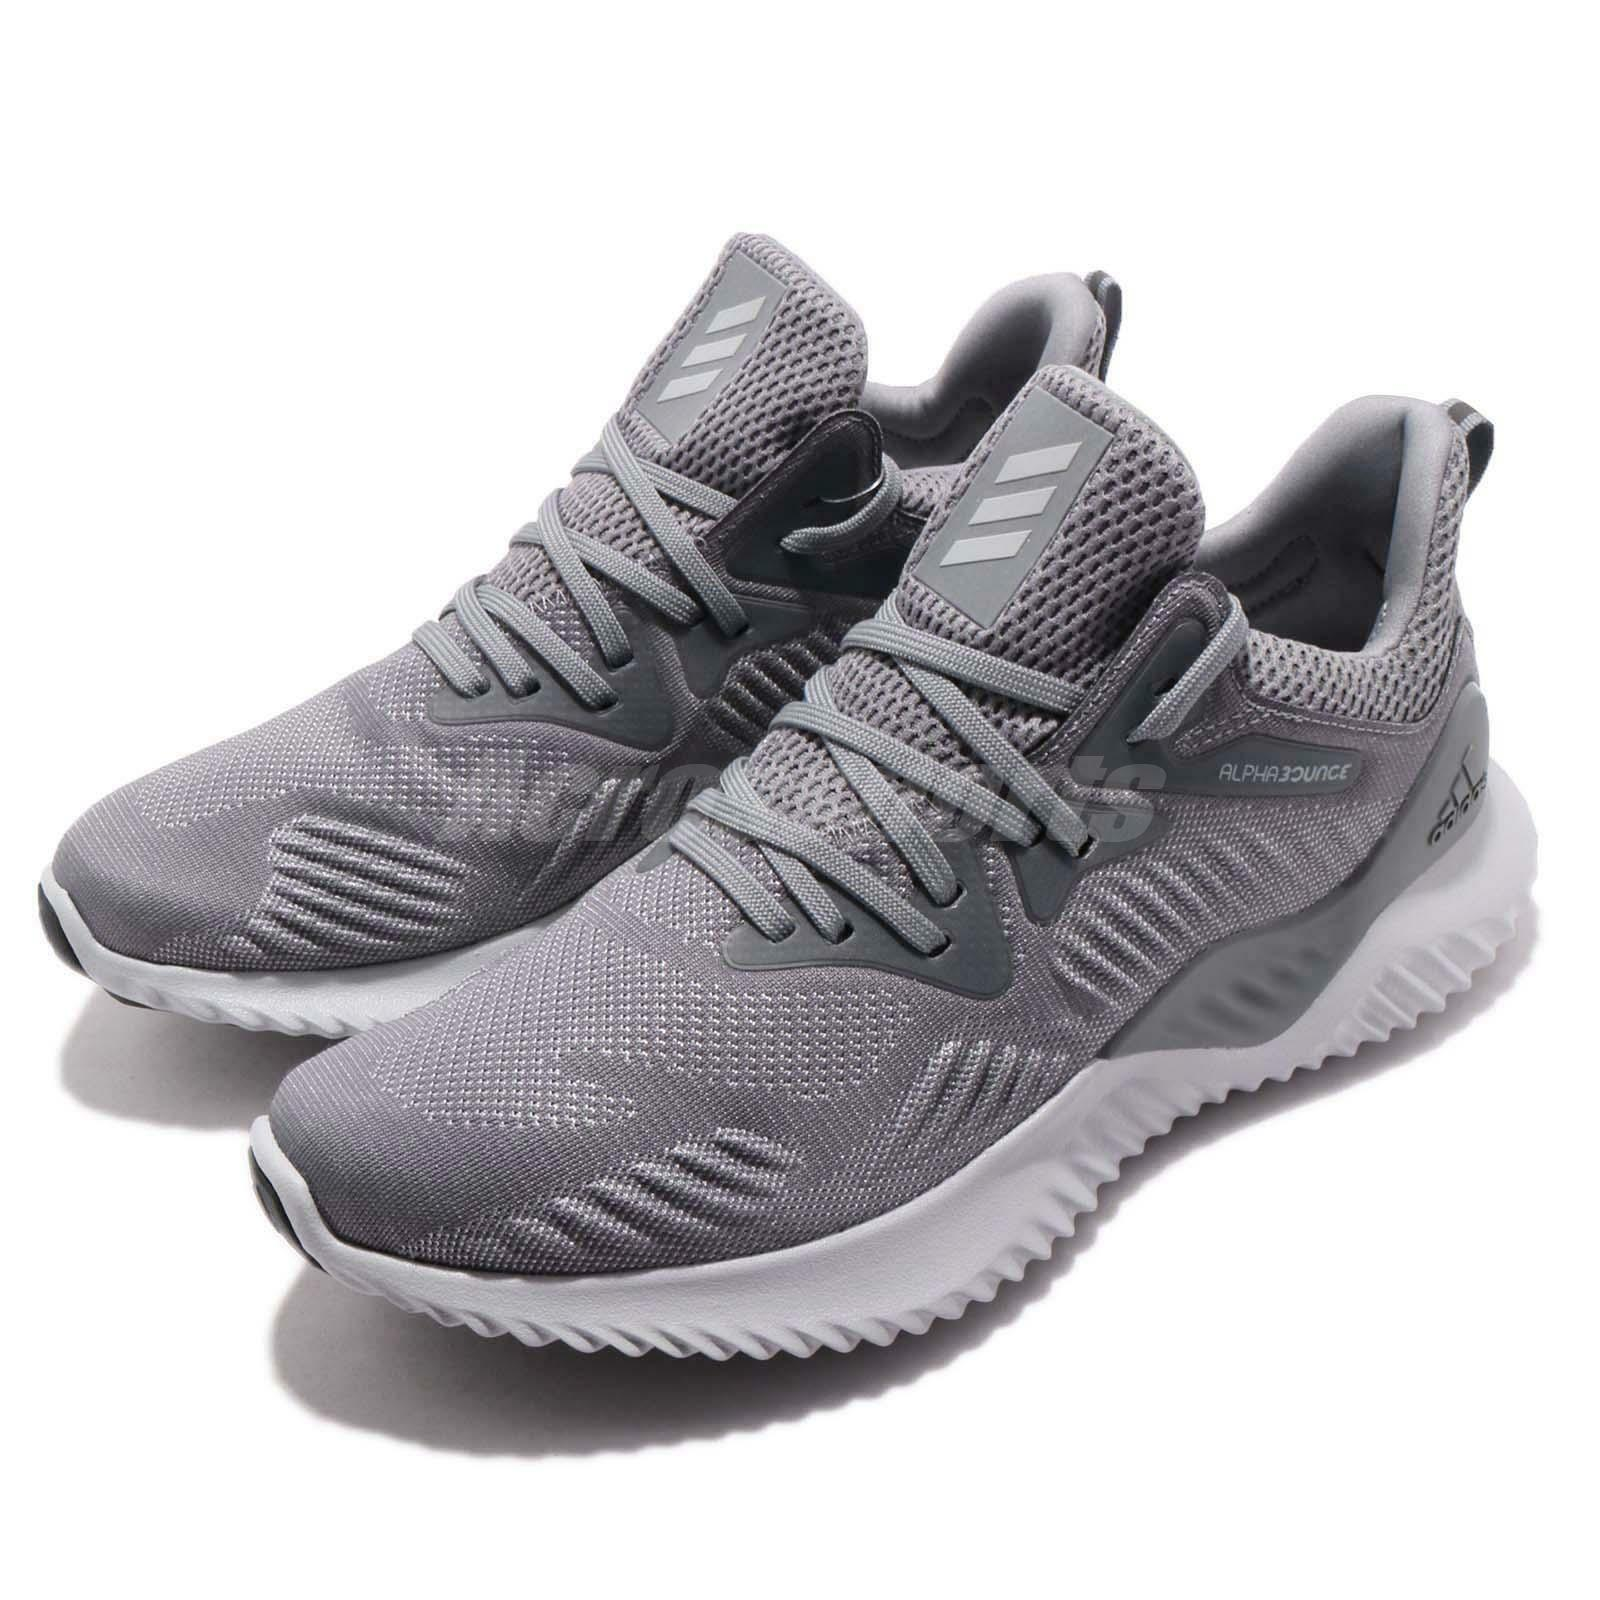 Adidas Alphabounce Beyond M Grey Men Running  Training shoes Sneakers CG4765  fashion